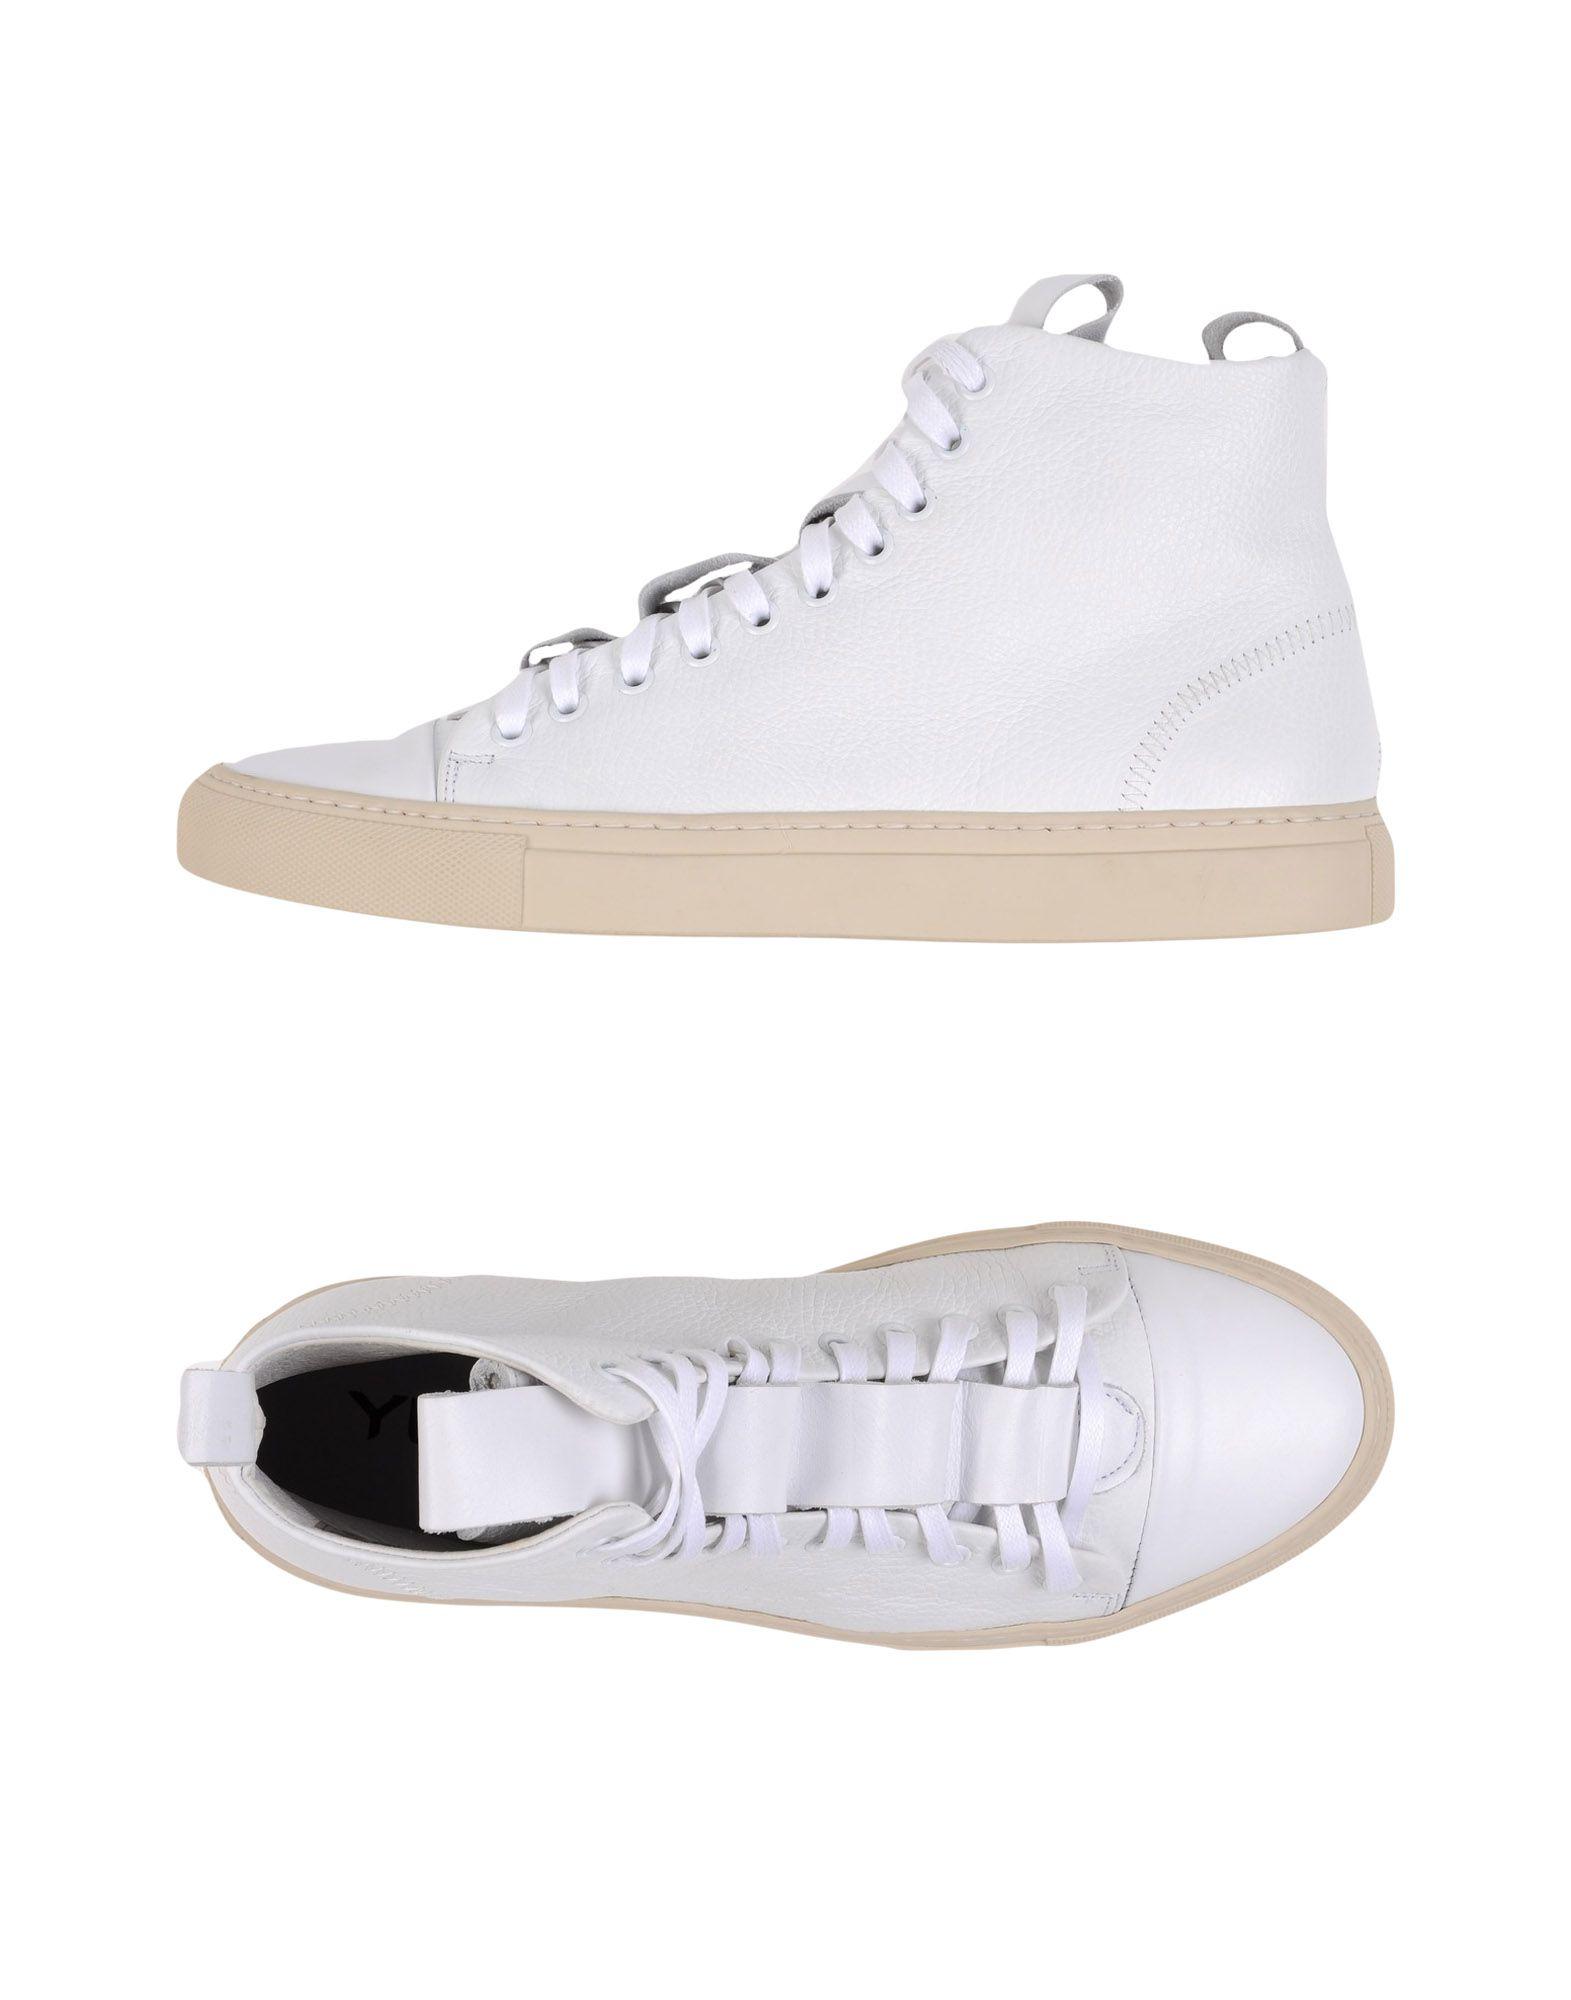 Rabatt echte Schuhe Ylati Sneakers Herren  11144645RT